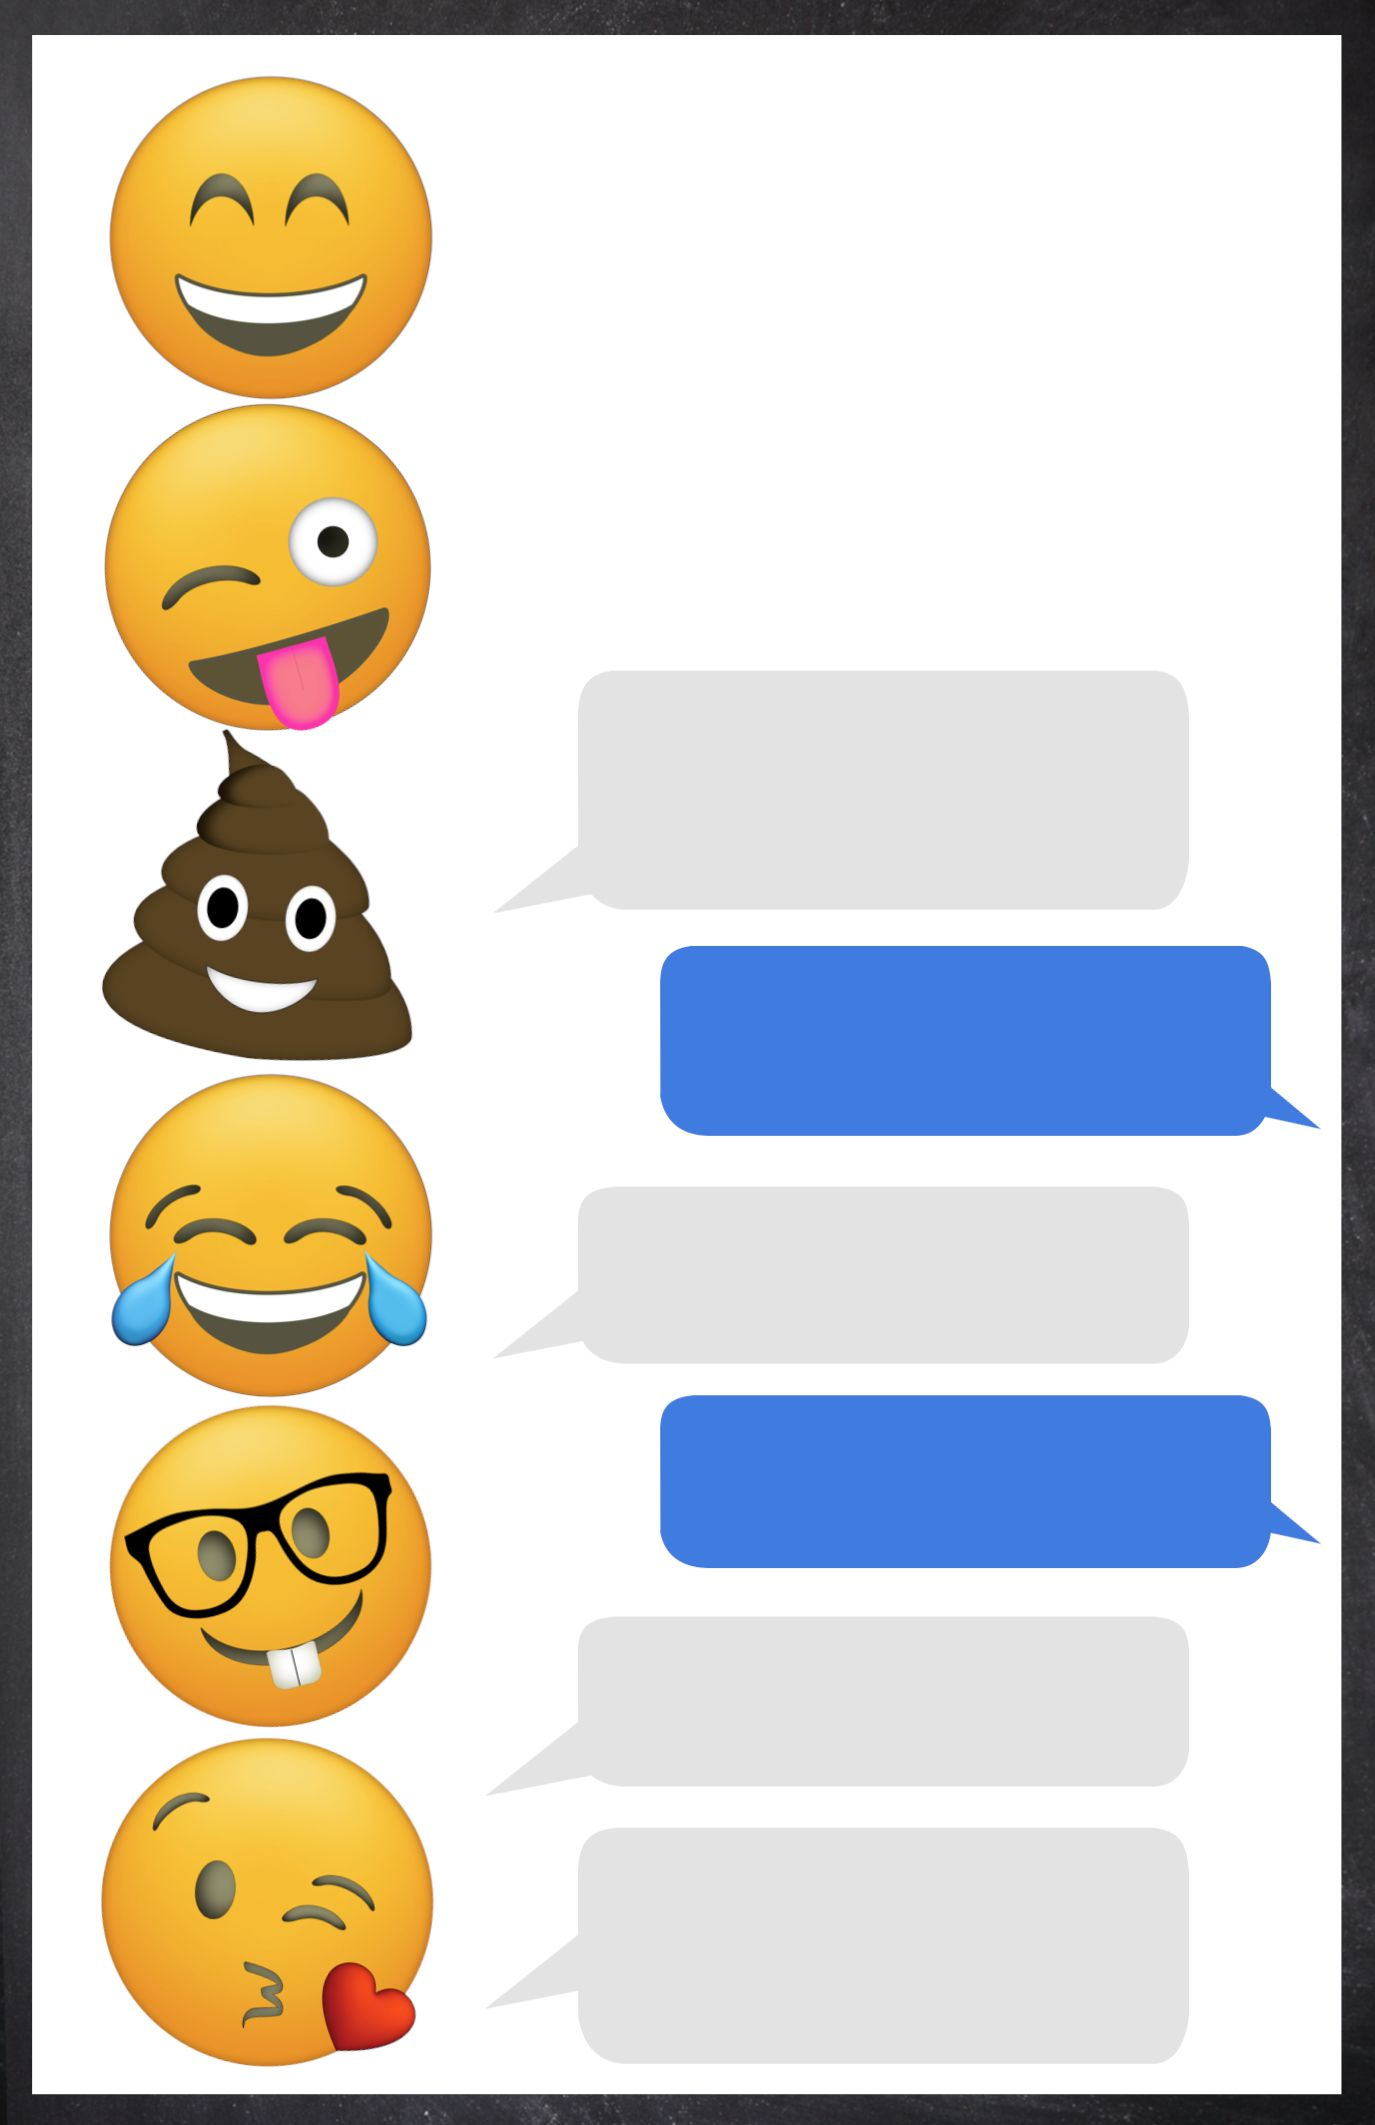 Pinjf And Company On Jorja's 8Th B-Day   Birthday Invitations - Emoji Invitations Printable Free